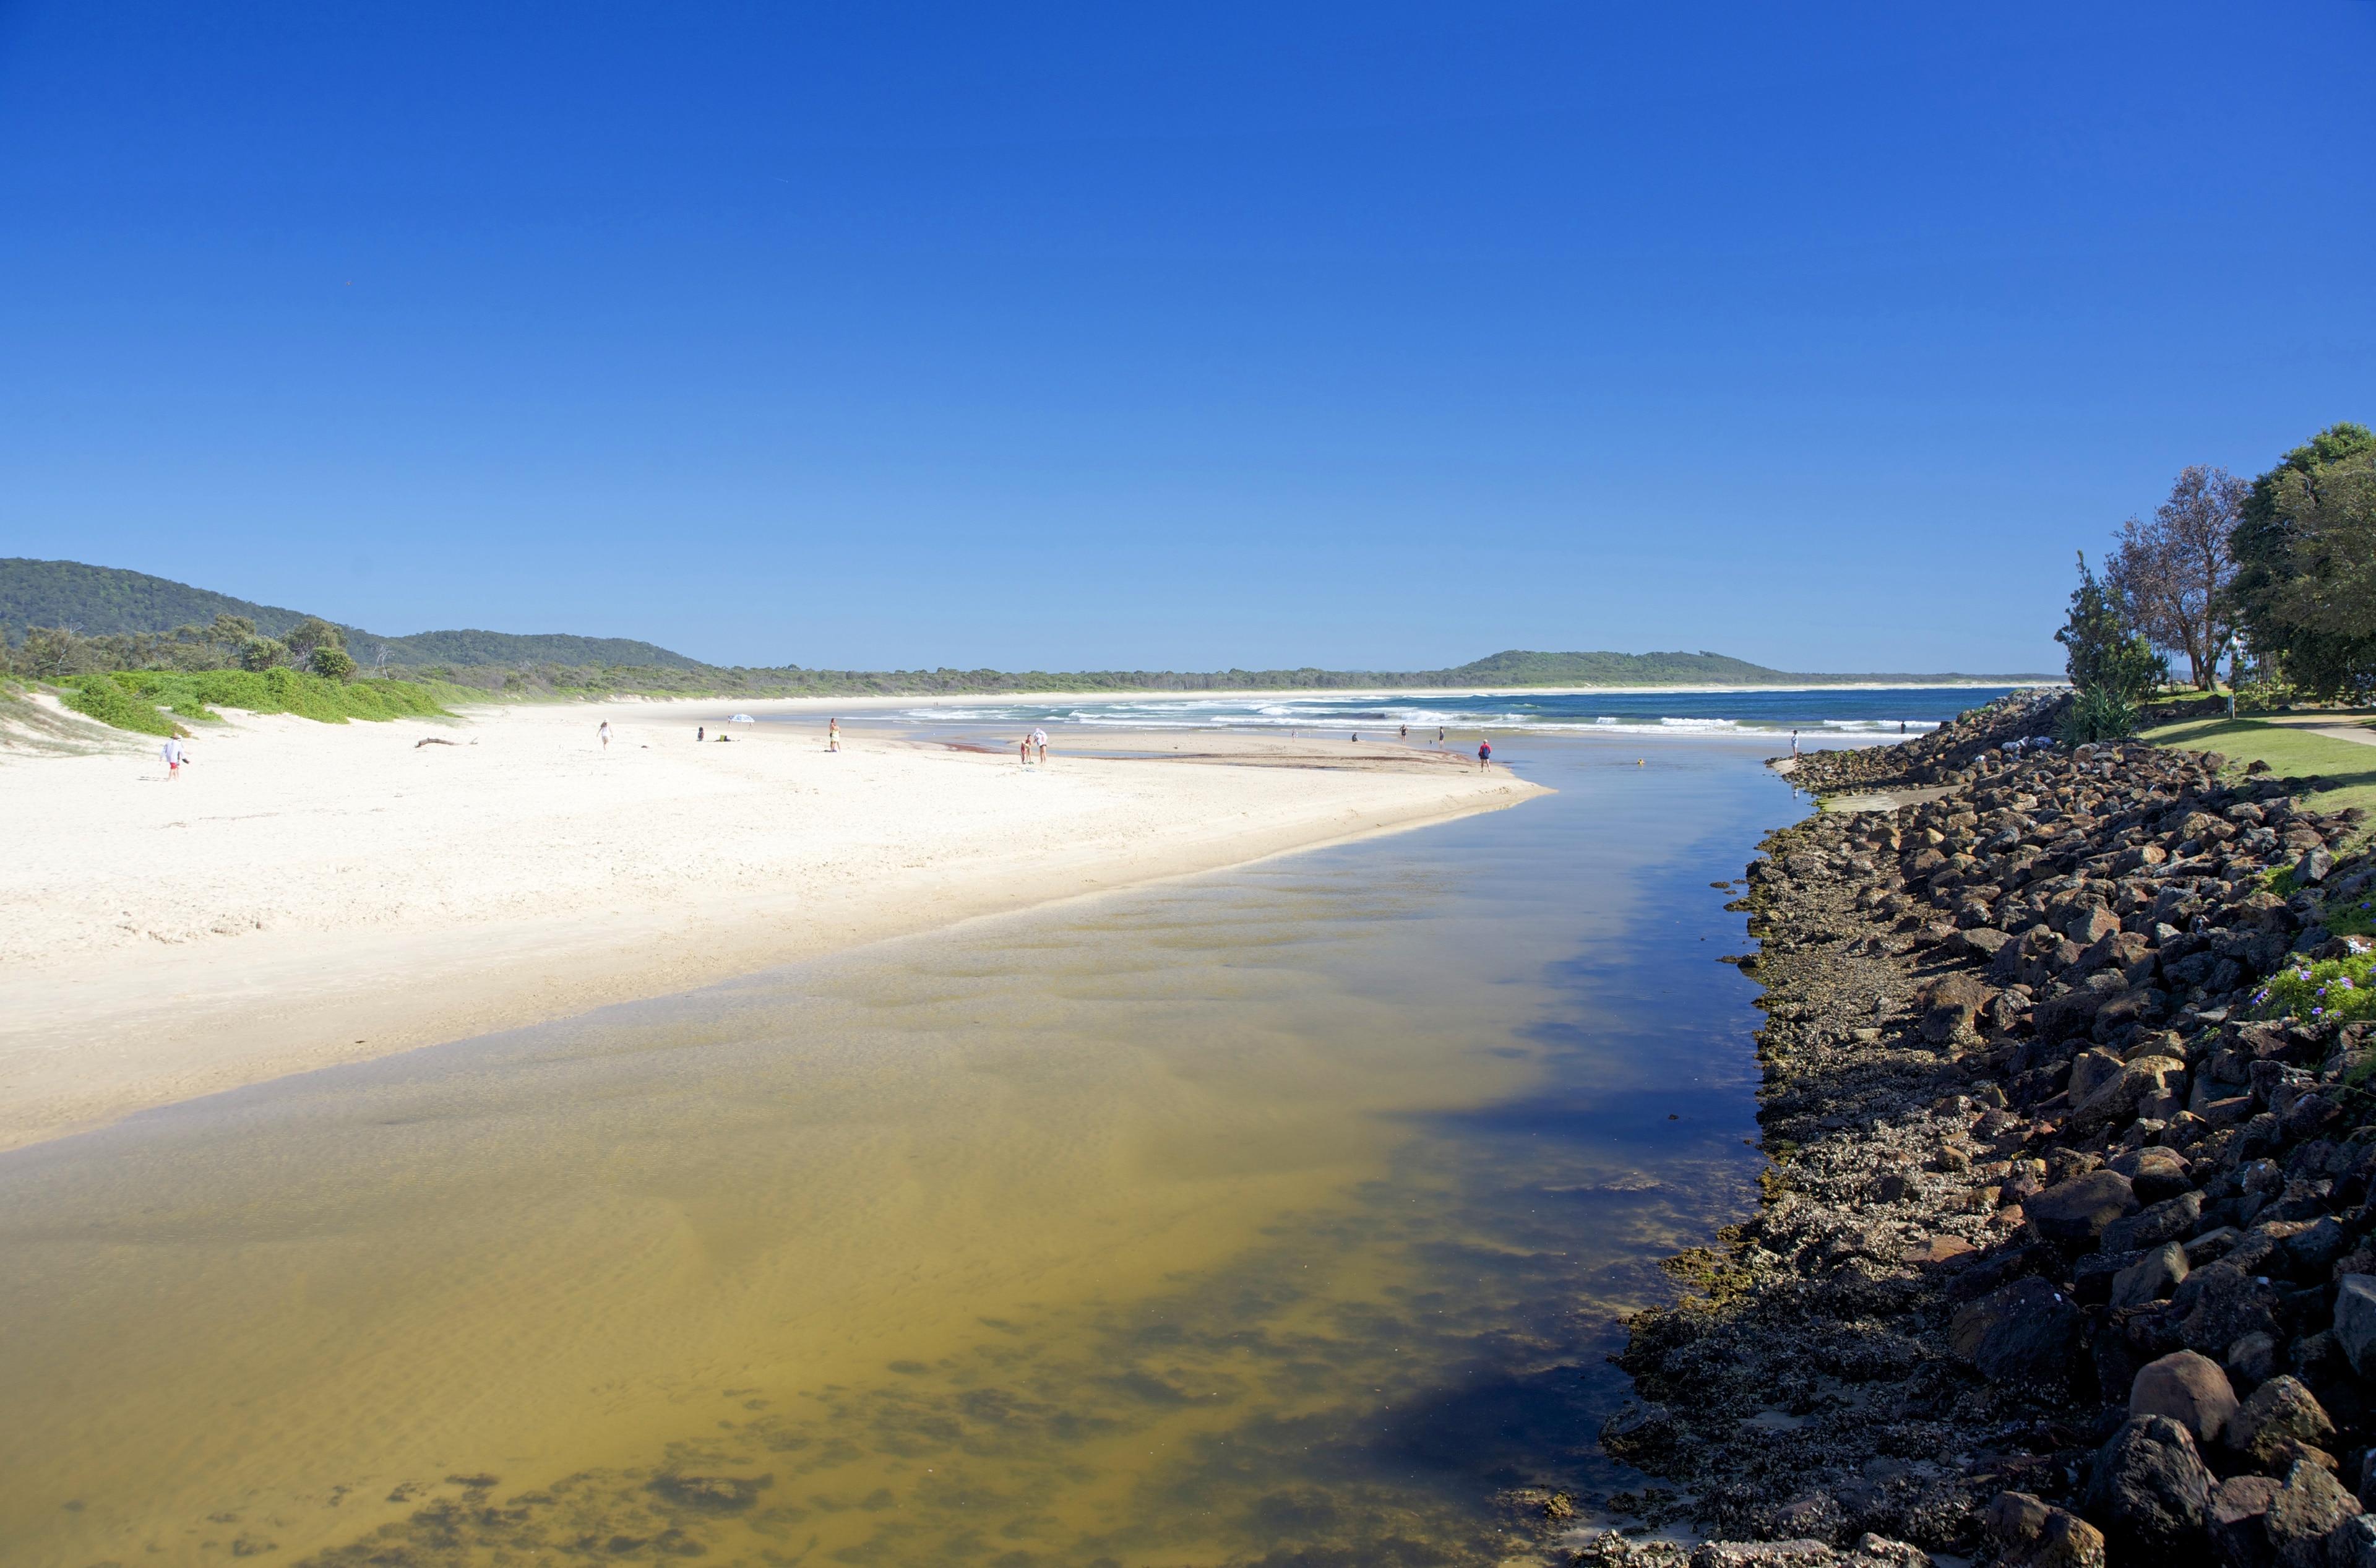 Crescent Head, New South Wales, Australia